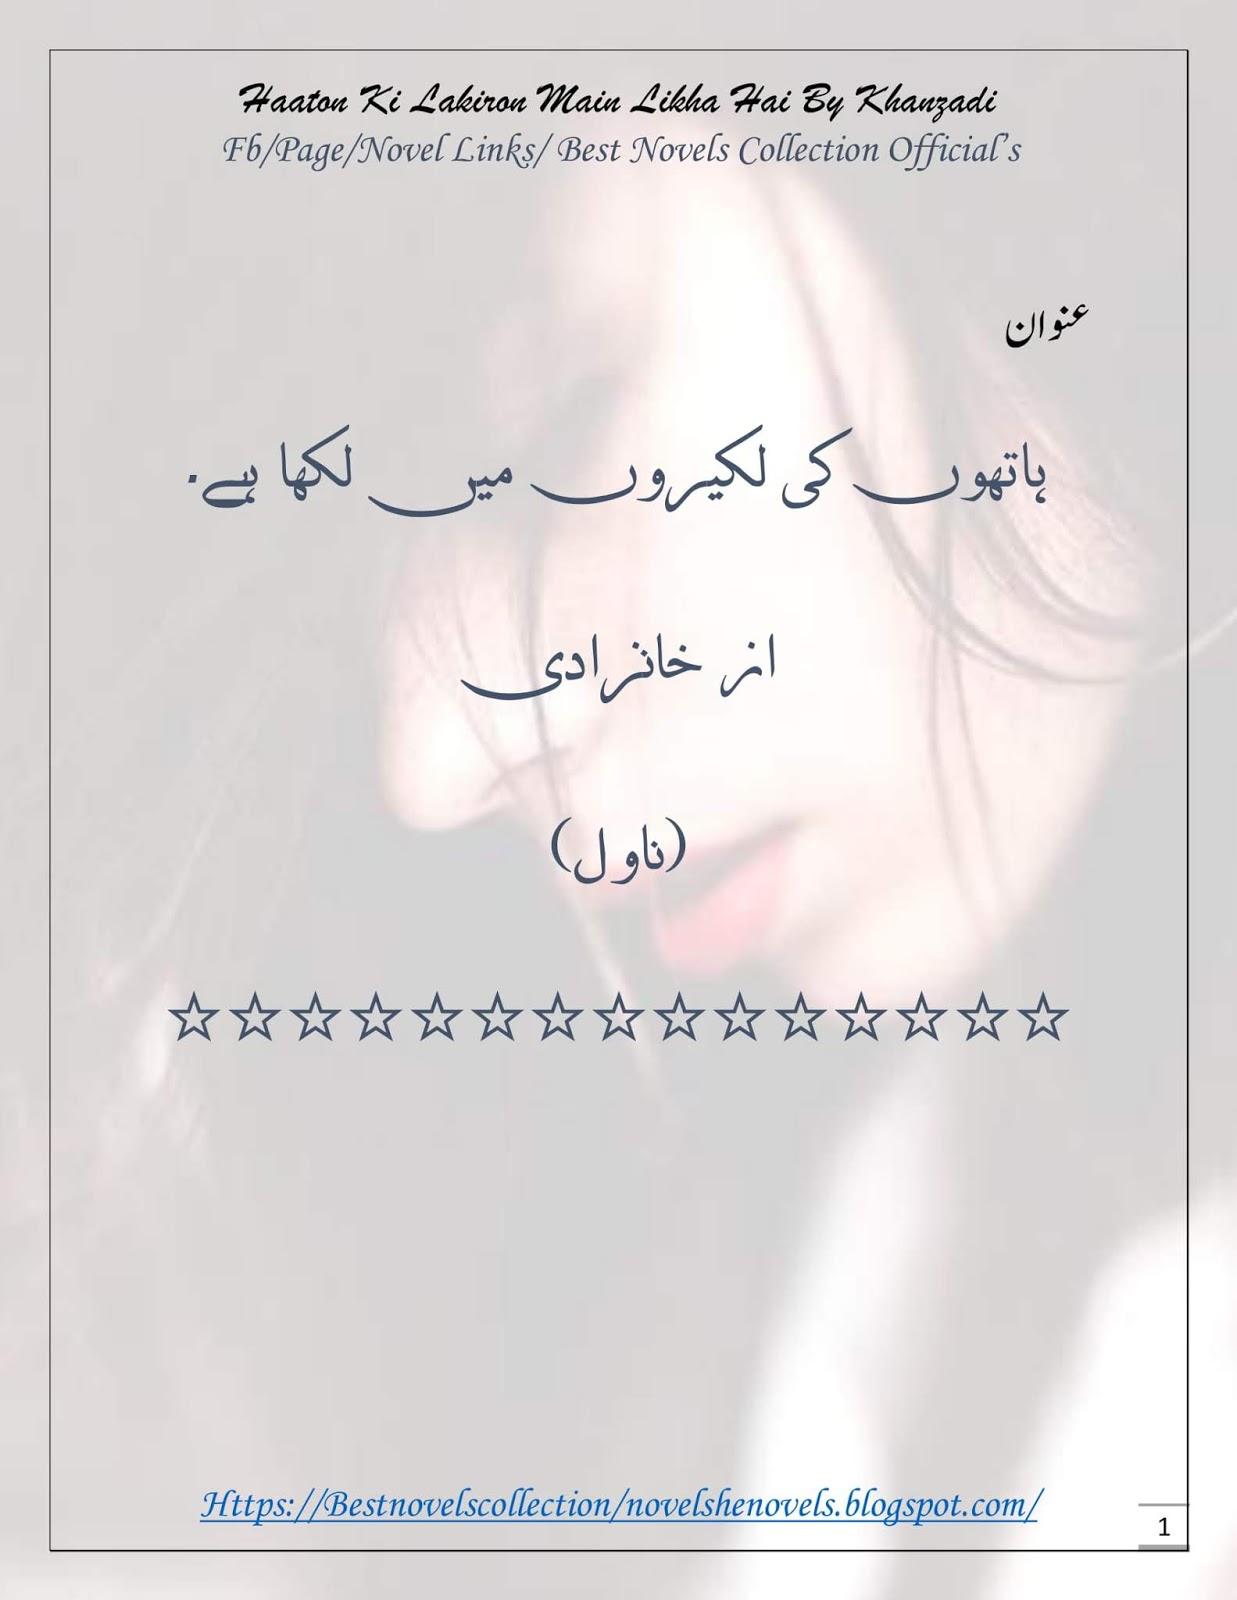 Hathon Ki Lakeeron Main Likha Hai By Khanzadi Rude Hero Novel